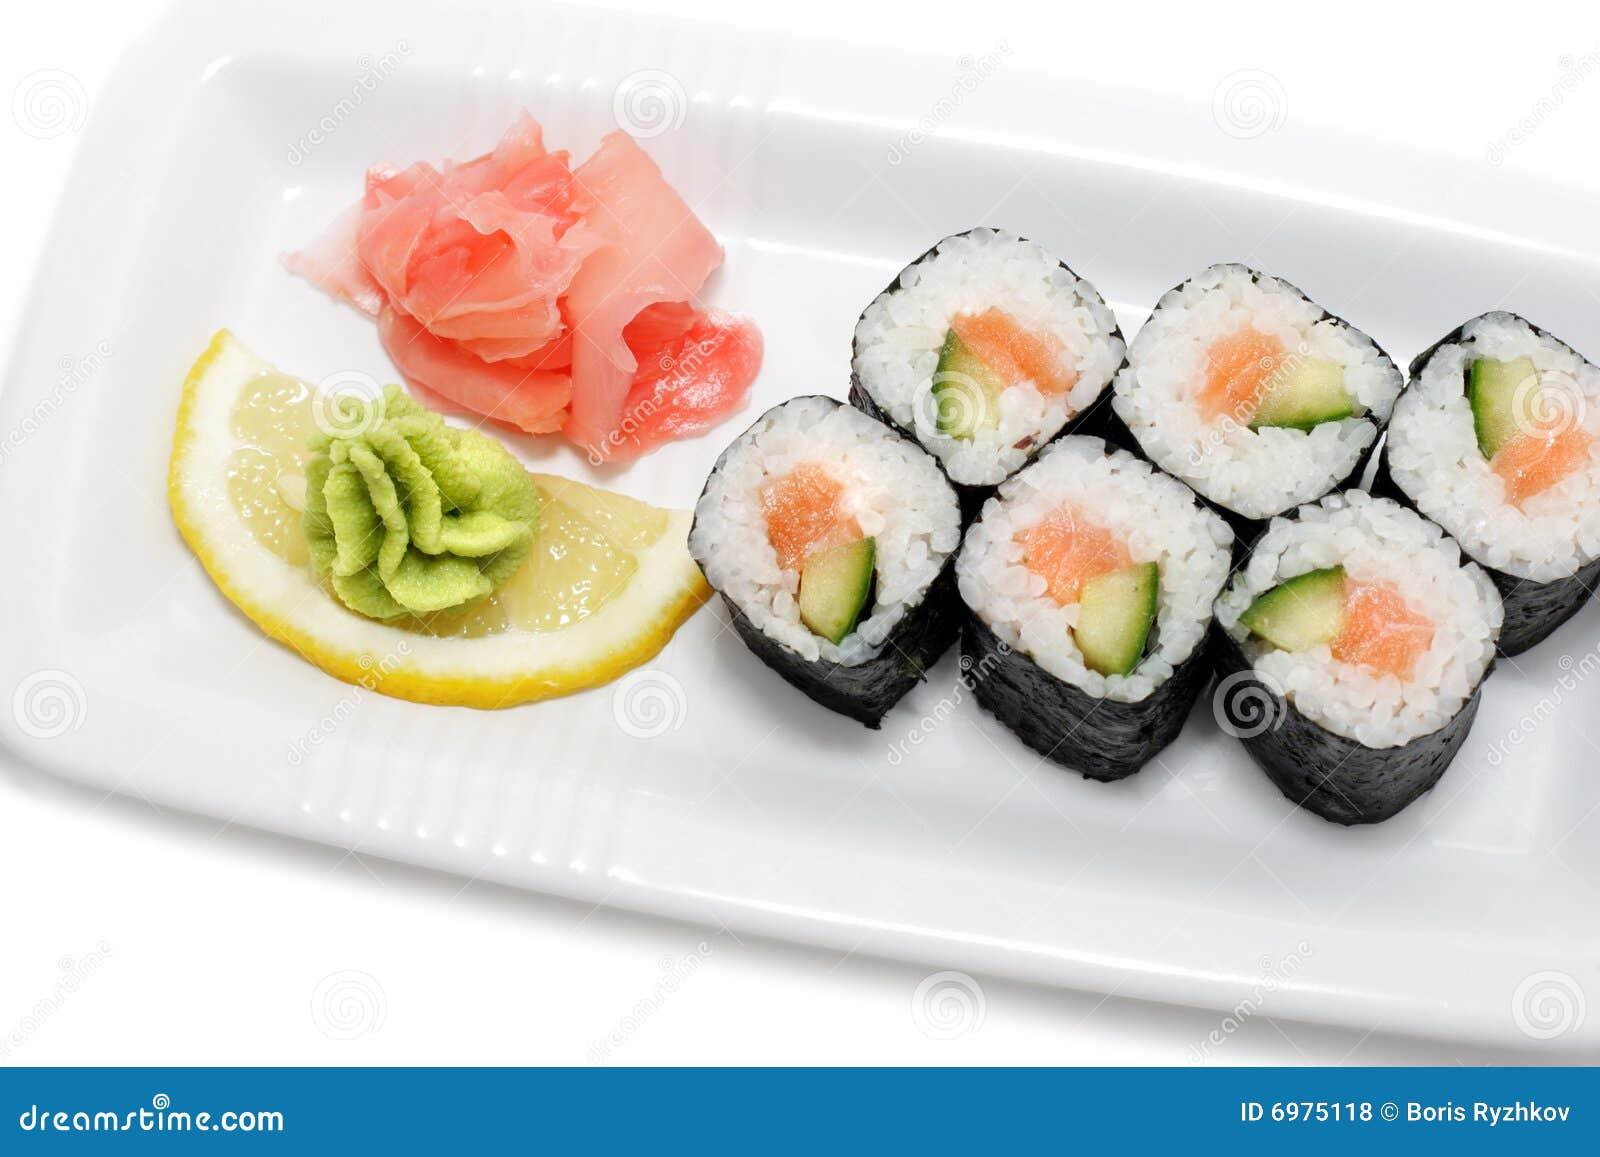 images How to Eat Nigiri Sushi